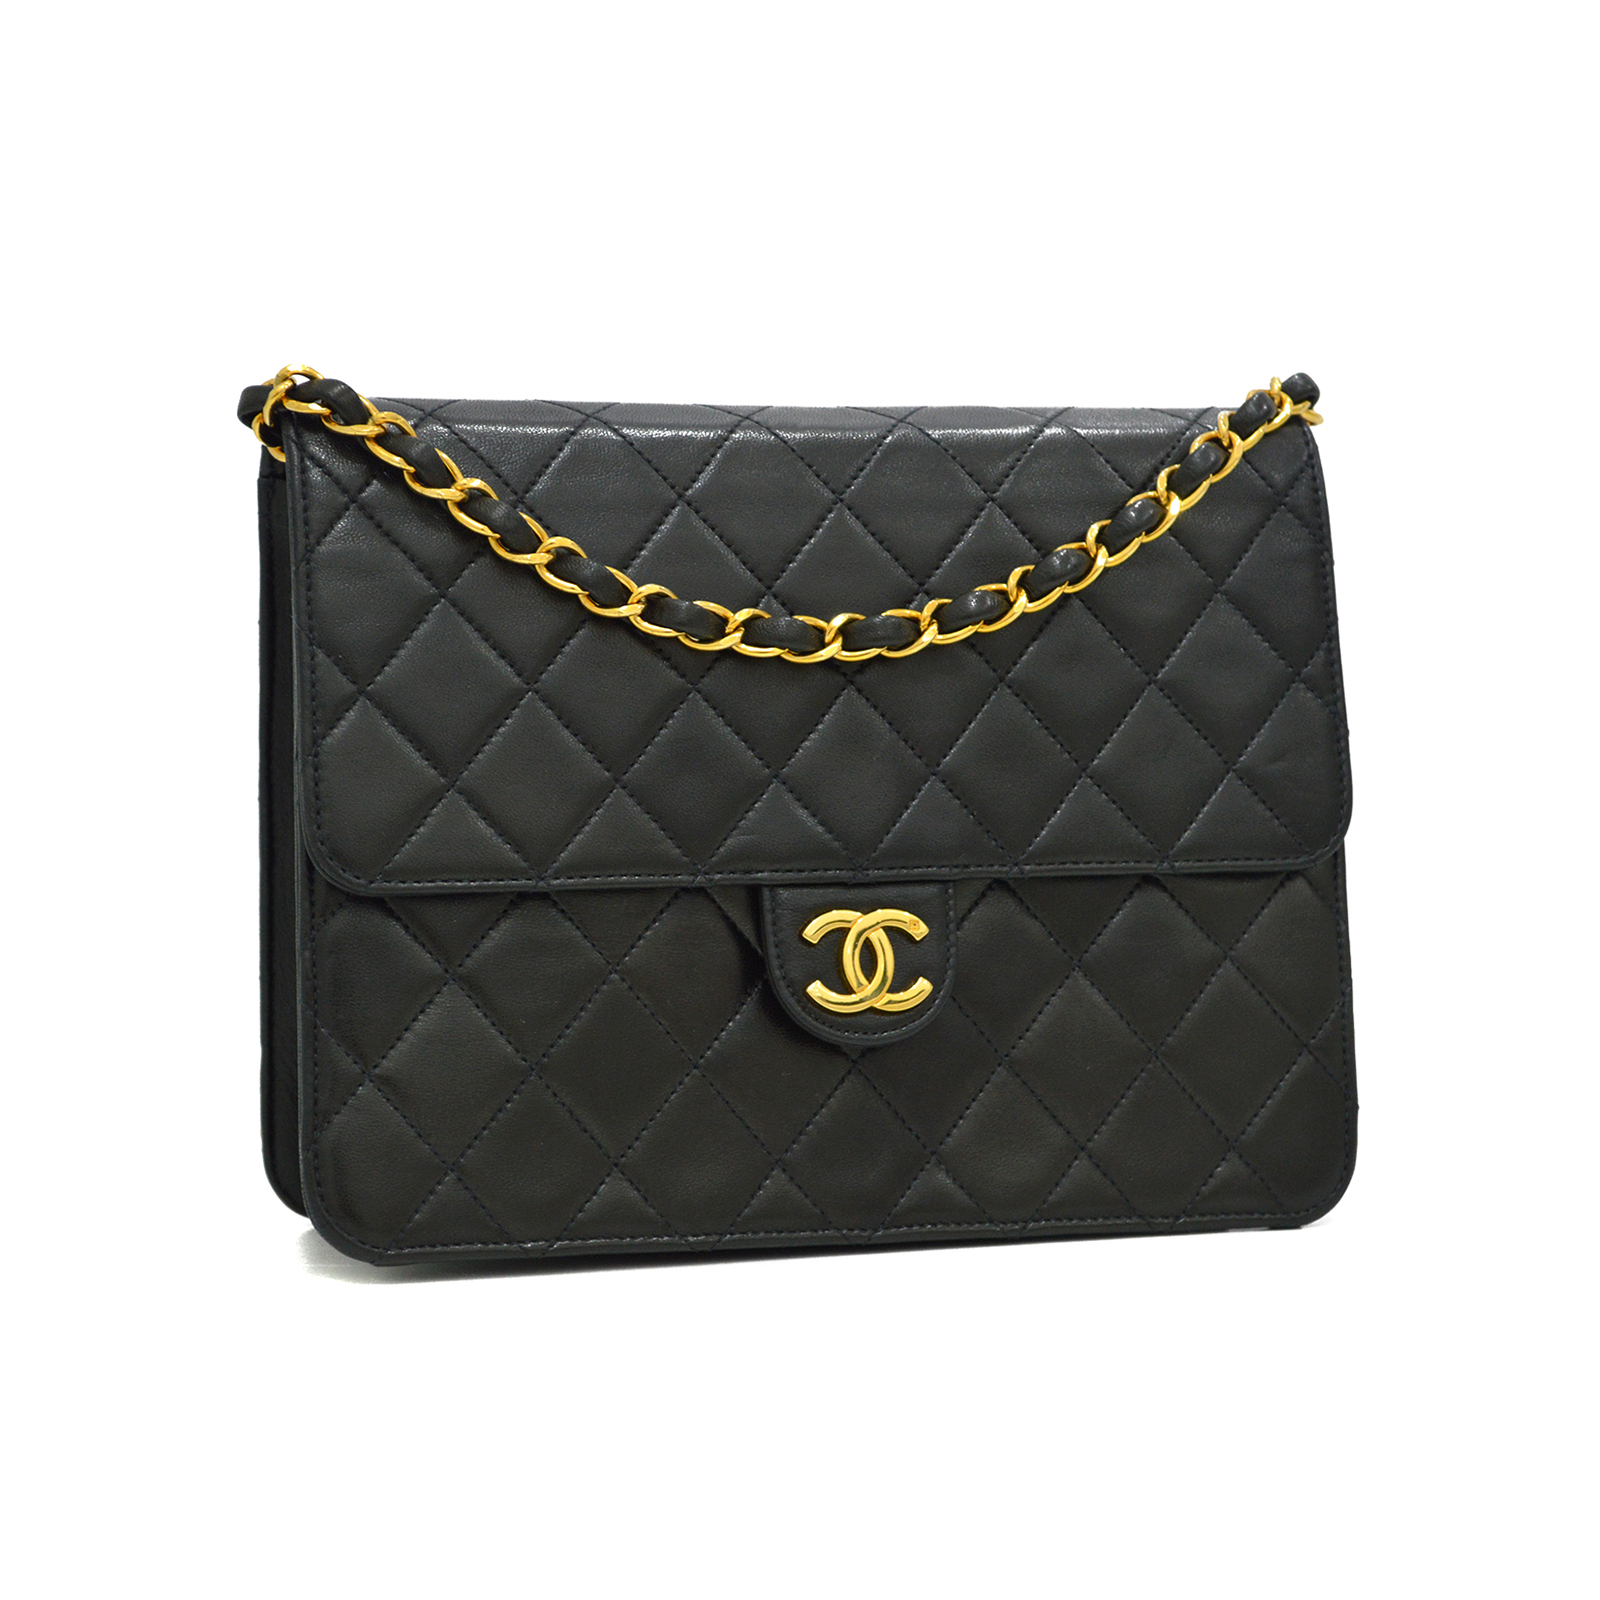 CHANEL Classic 2 Way Flap Bag